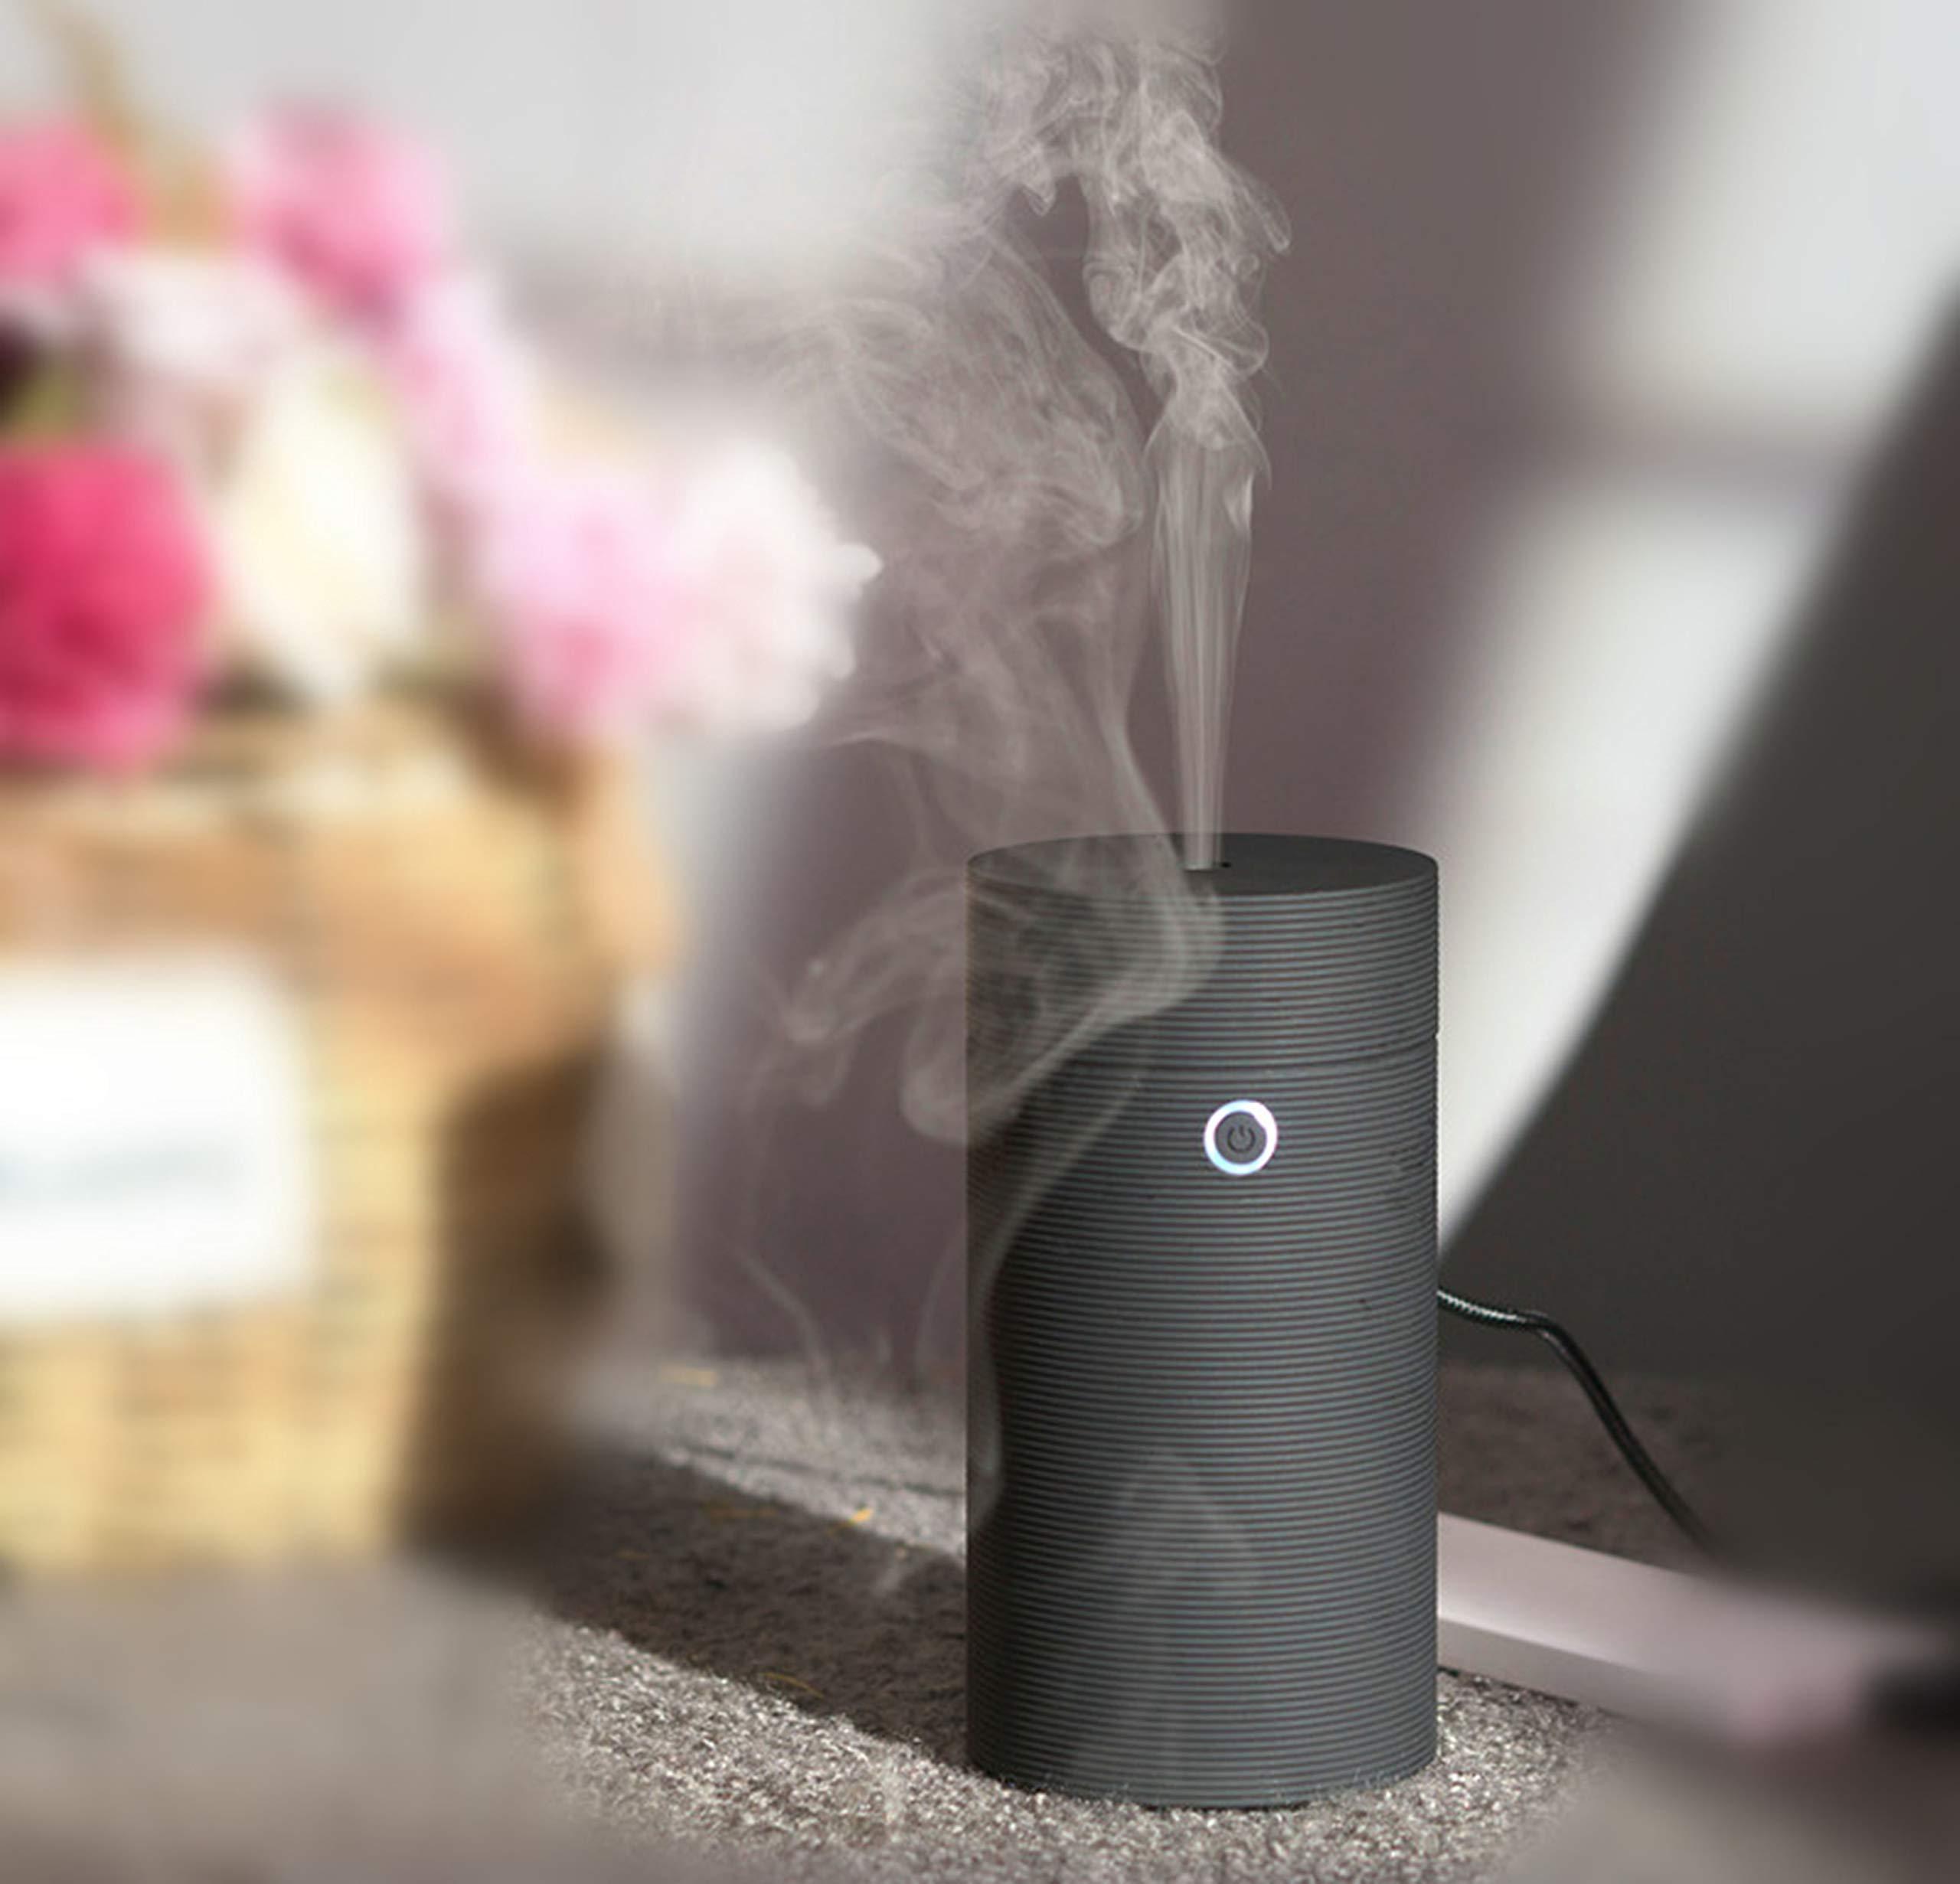 Aomy Mini Ultrasonic Essential Oil Diffuser Air Refresher Cool Mist Car Humidifier Auto Shut-Off for Car Office Bedroom Bathroom (Screw Thread Black)